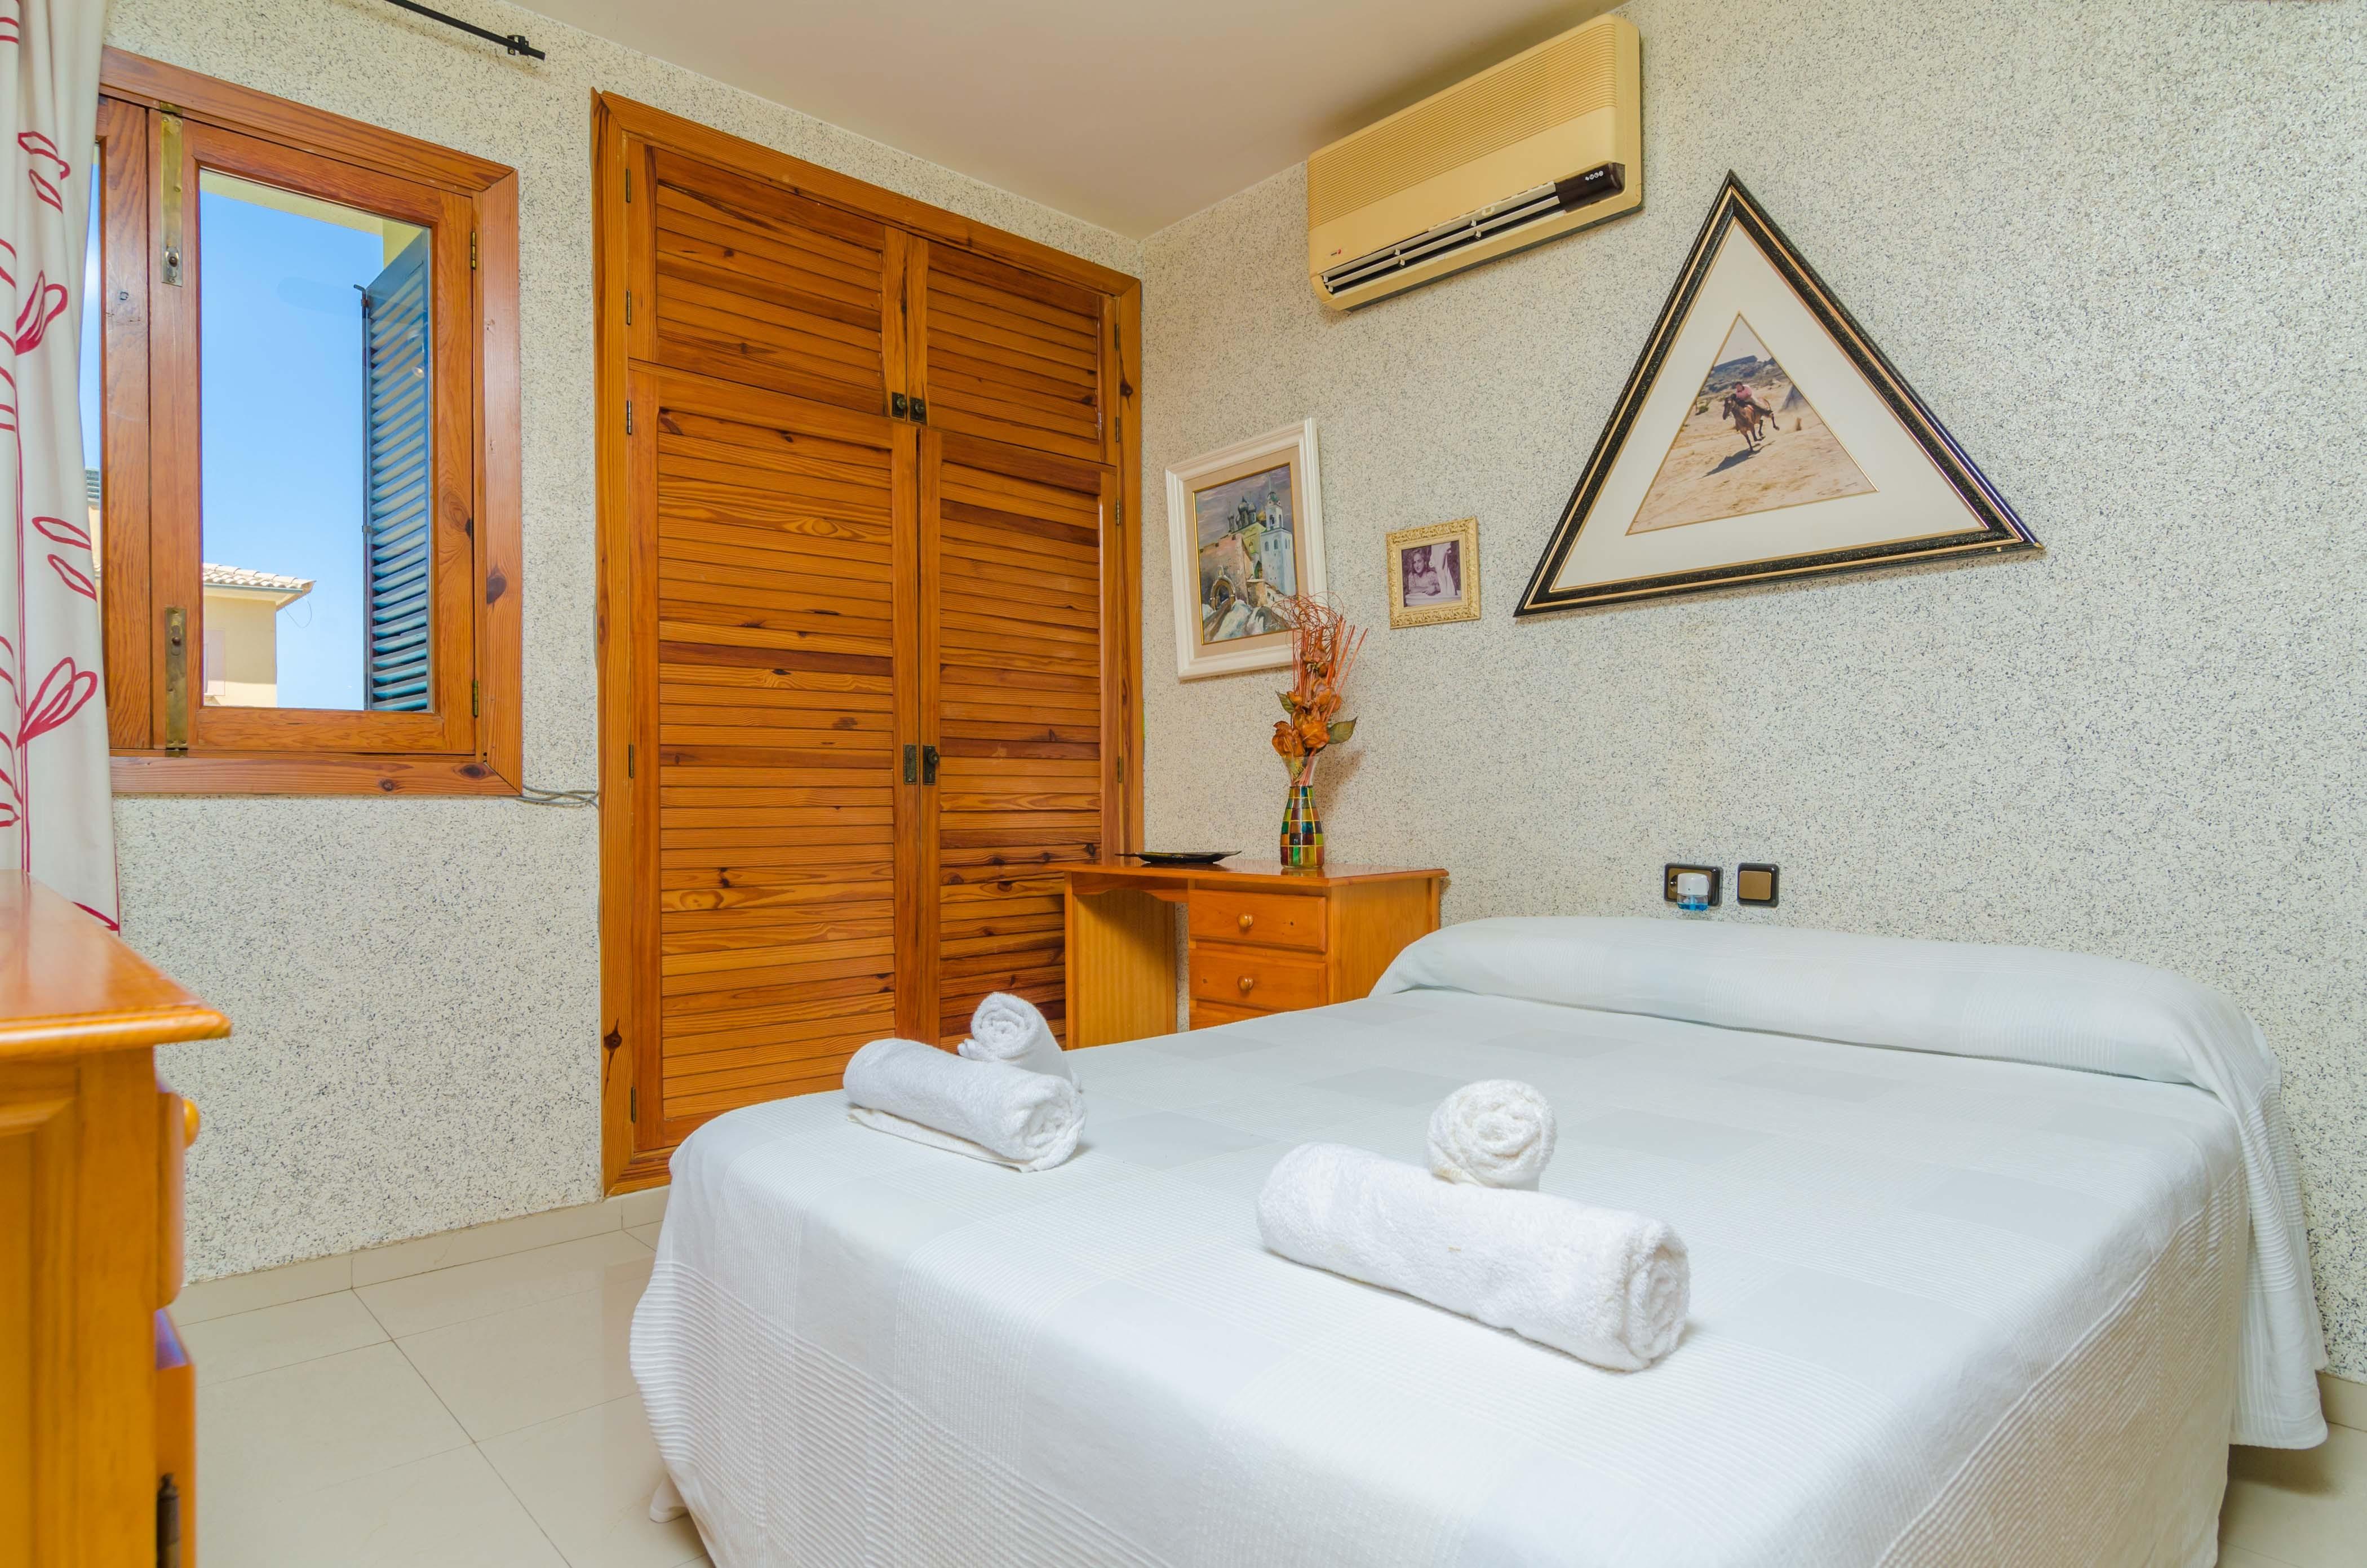 Ferienhaus CAN GORI (2296828), Badia Gran, Mallorca, Balearische Inseln, Spanien, Bild 20